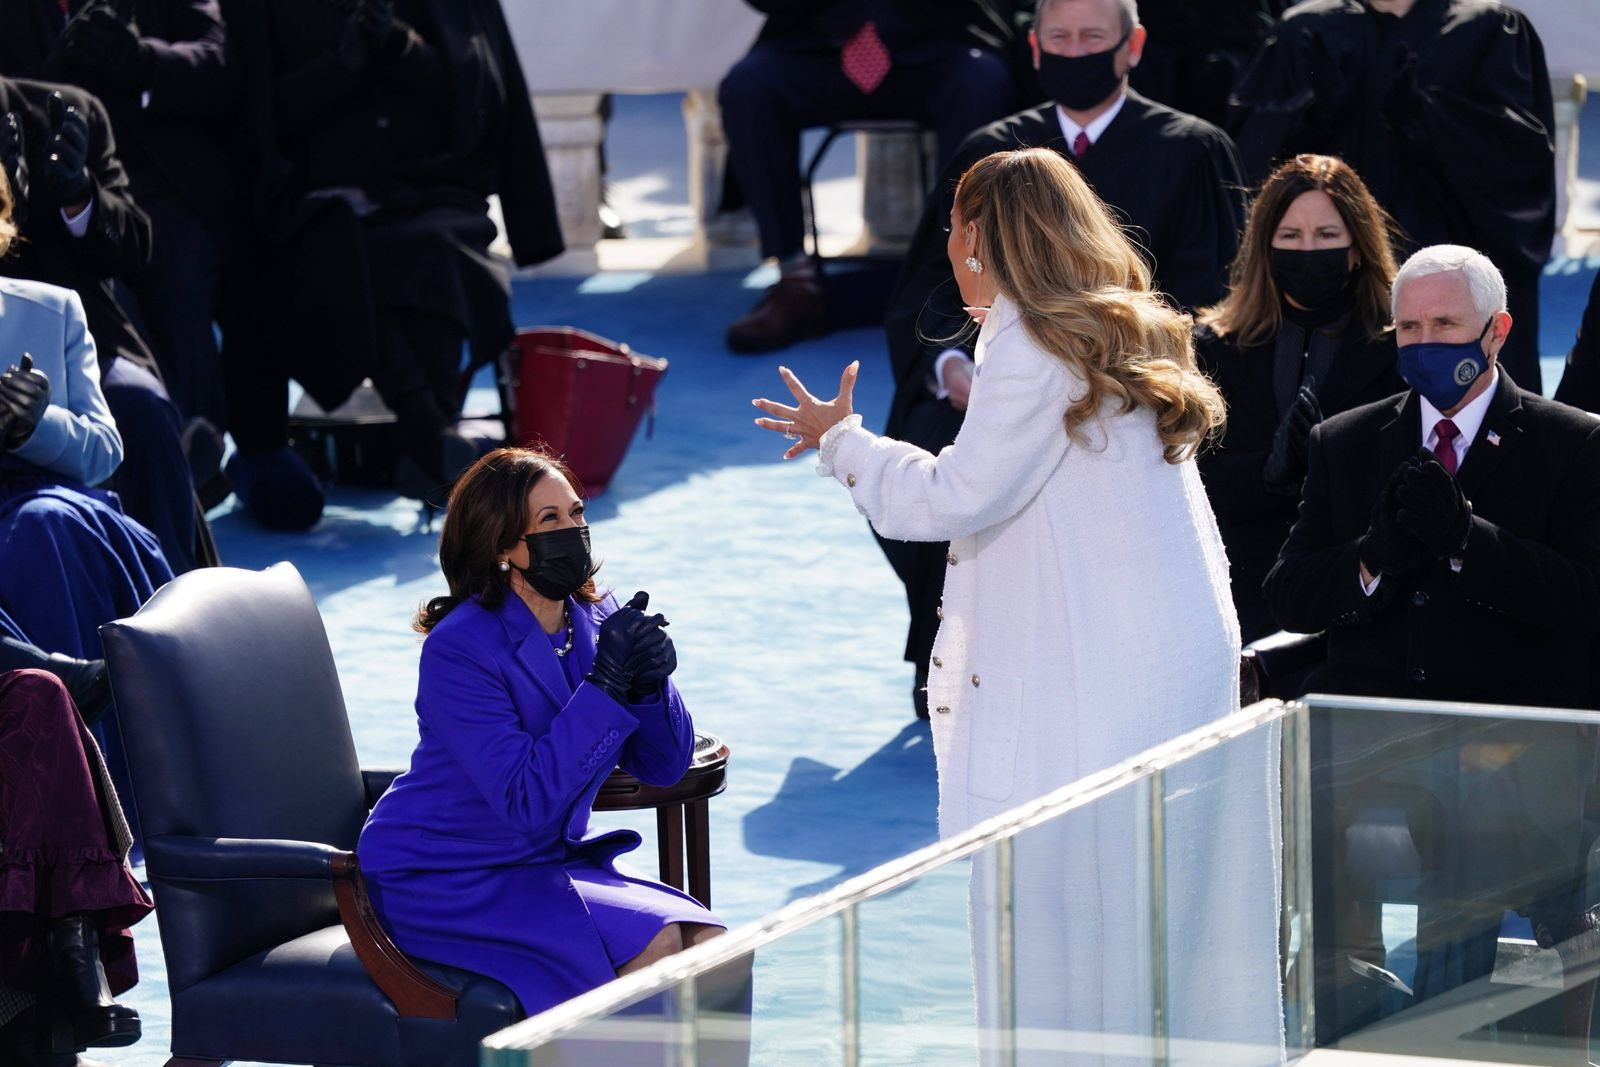 January 20, 2021, Washington, District of Columbia, USA: Vice President Kamala Harris reacts after singer Jennifer Lope